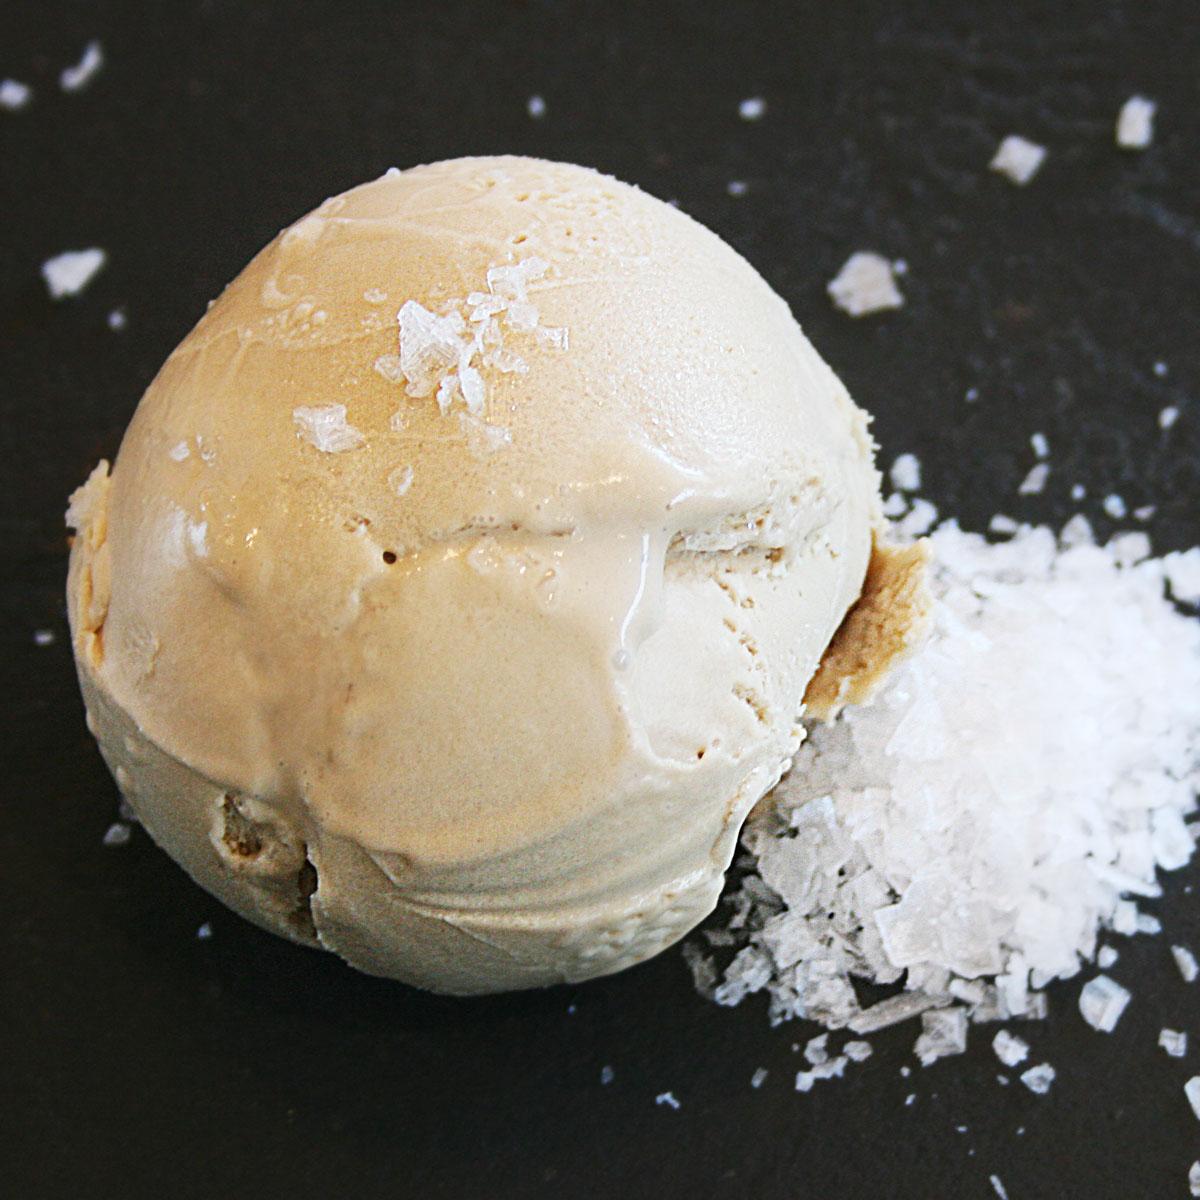 Salted Caramel Ice Cream 🧂🍯